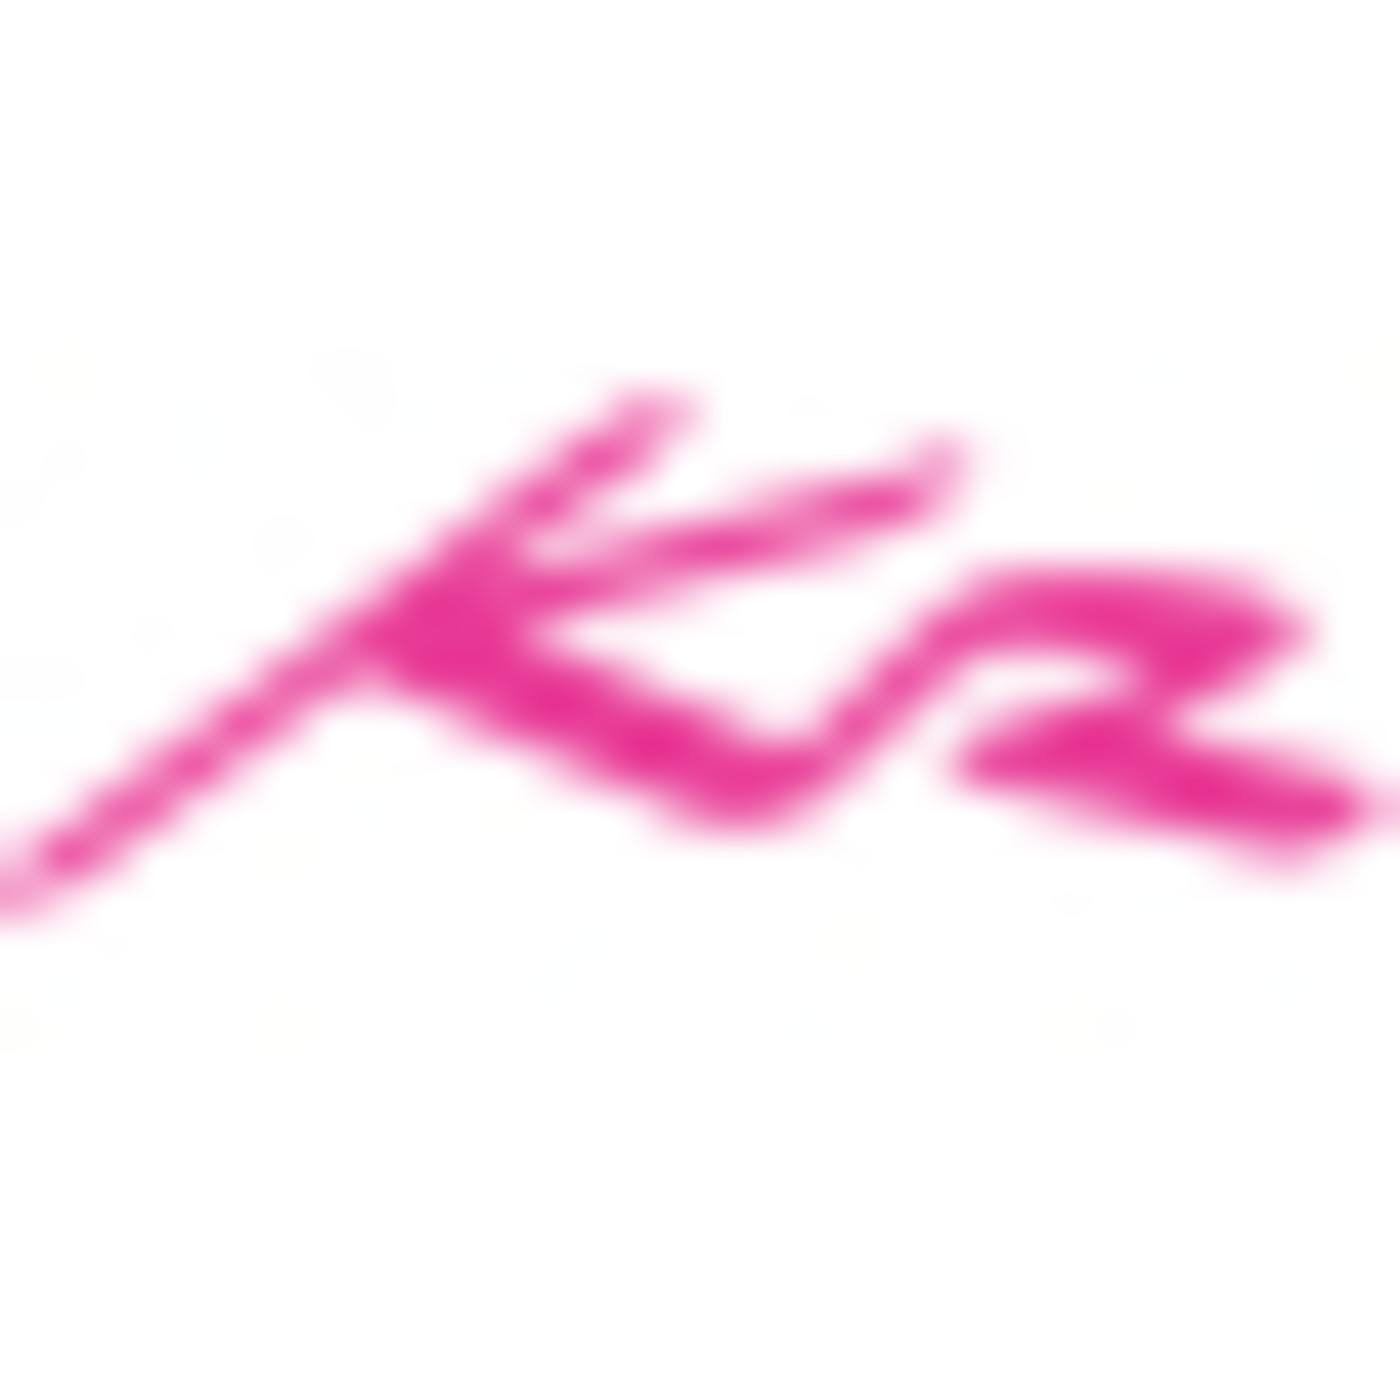 35ba2cde327 Kikay Reviews  adidas UltraBOOST X ATR en Kikay Runner on the Go en  mp3(14 12 a las 11 30 00) 09 20 30388940 - iVoox